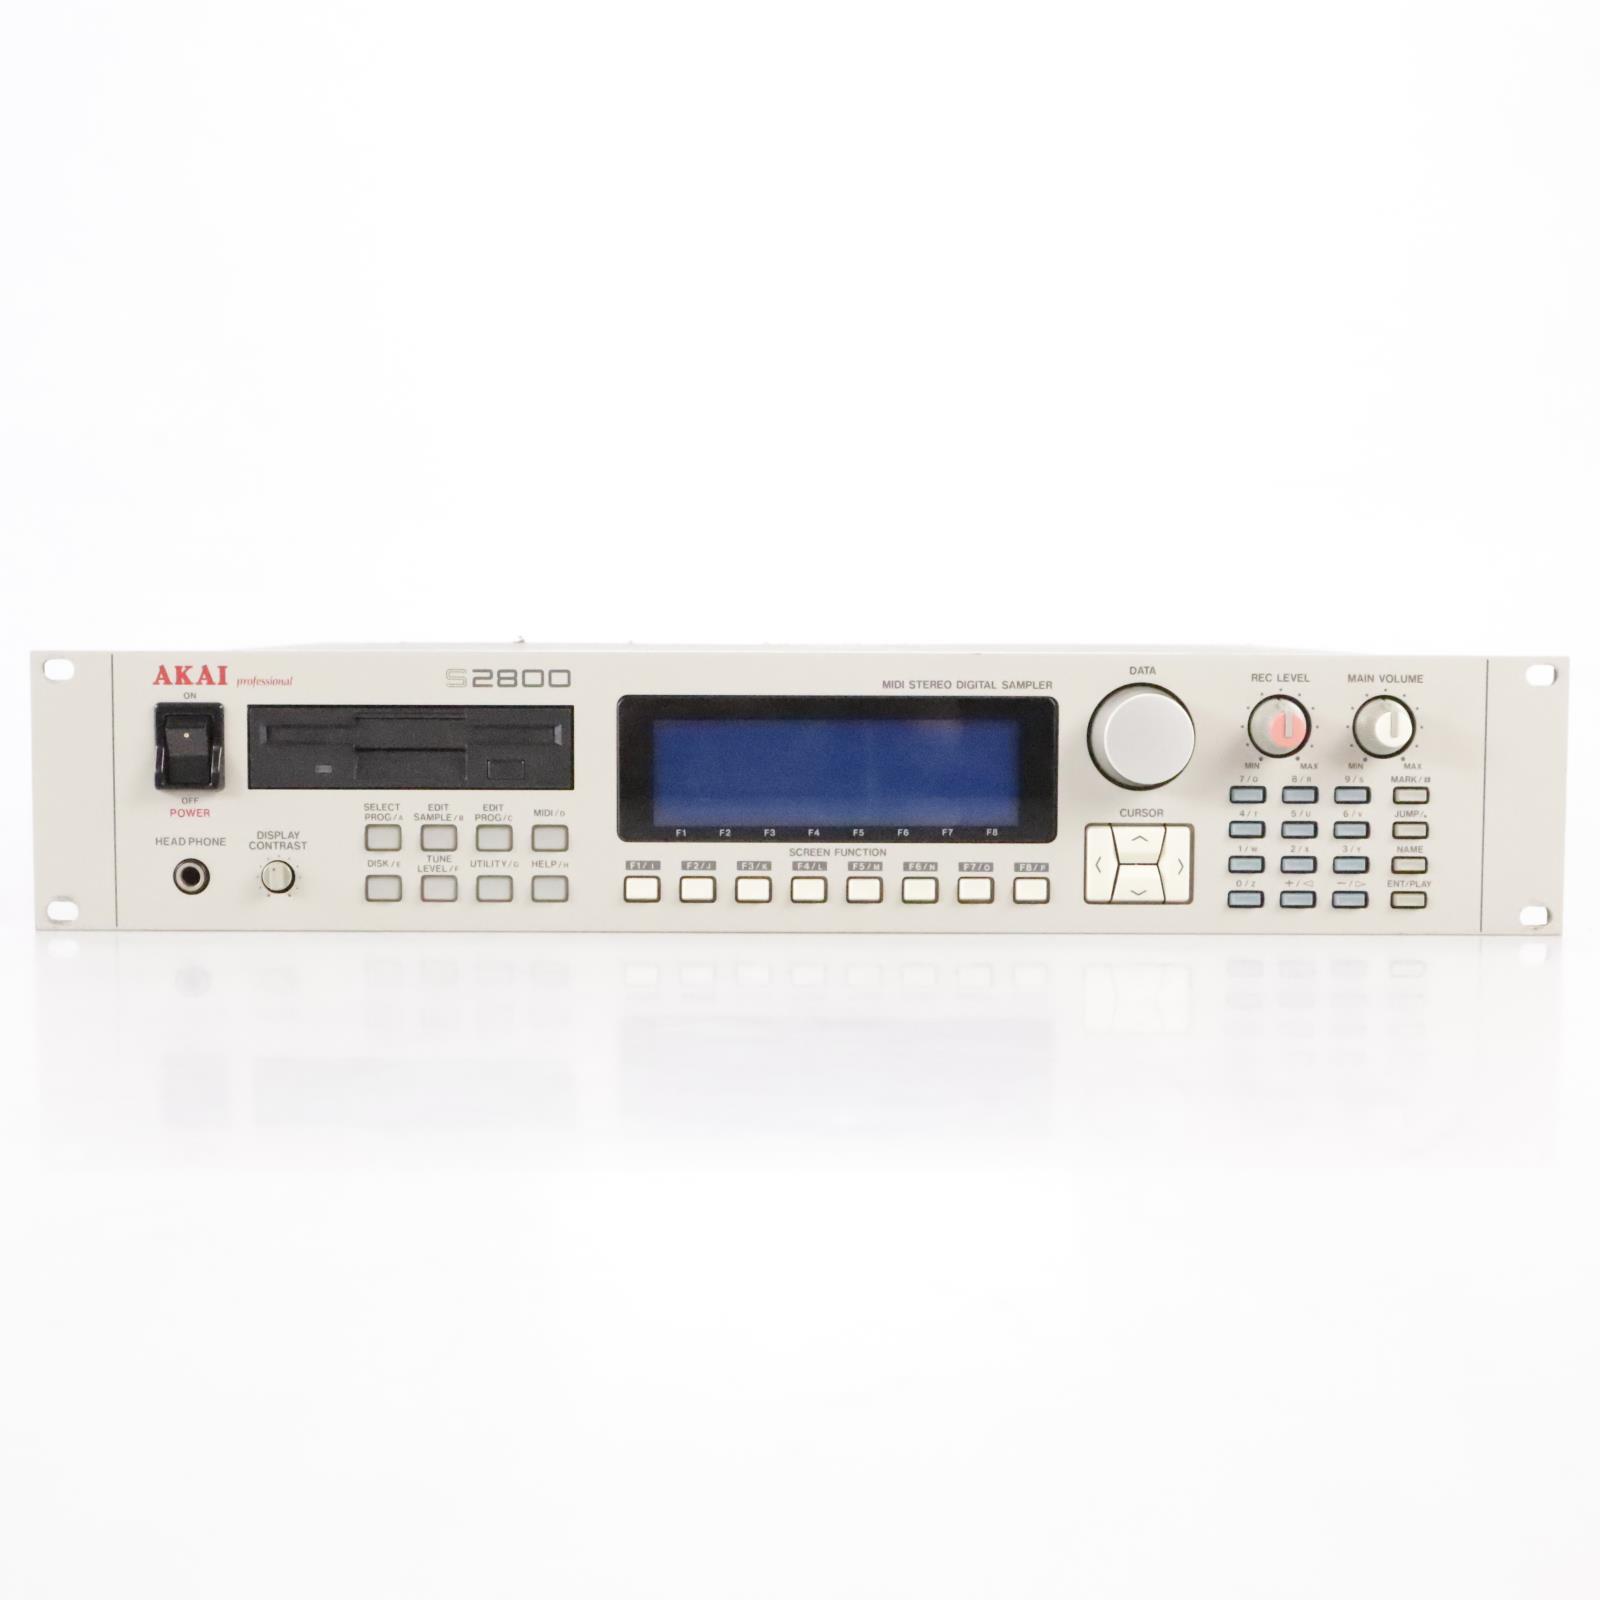 Akai S2800 Rack MIDI Stereo Digital Sampler #25016